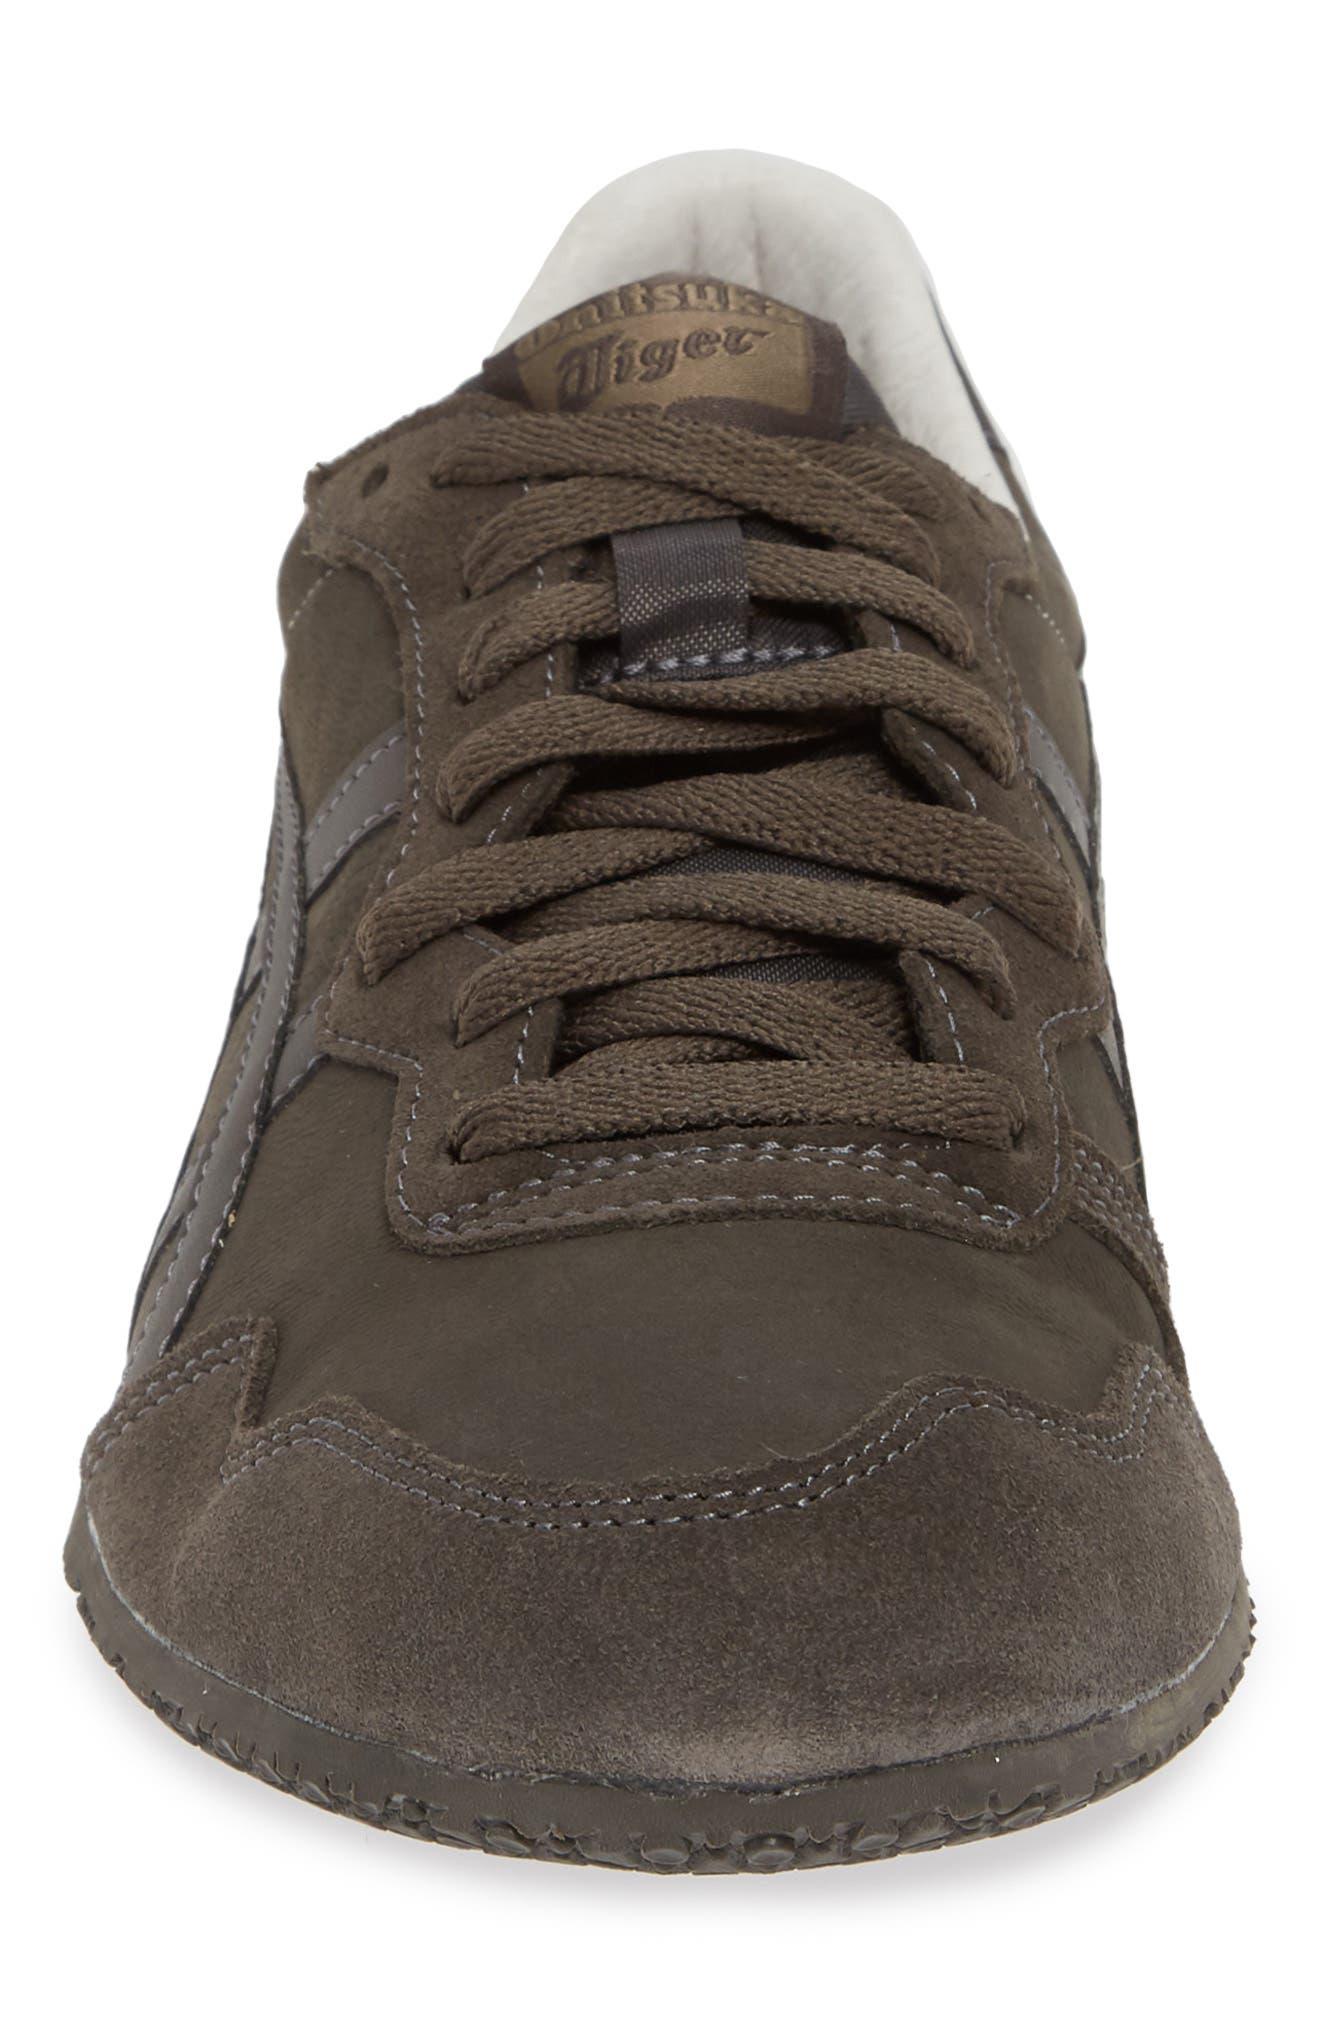 'Serrano' Sneaker,                             Alternate thumbnail 4, color,                             DARK SEPIA/ DARK SEPIA